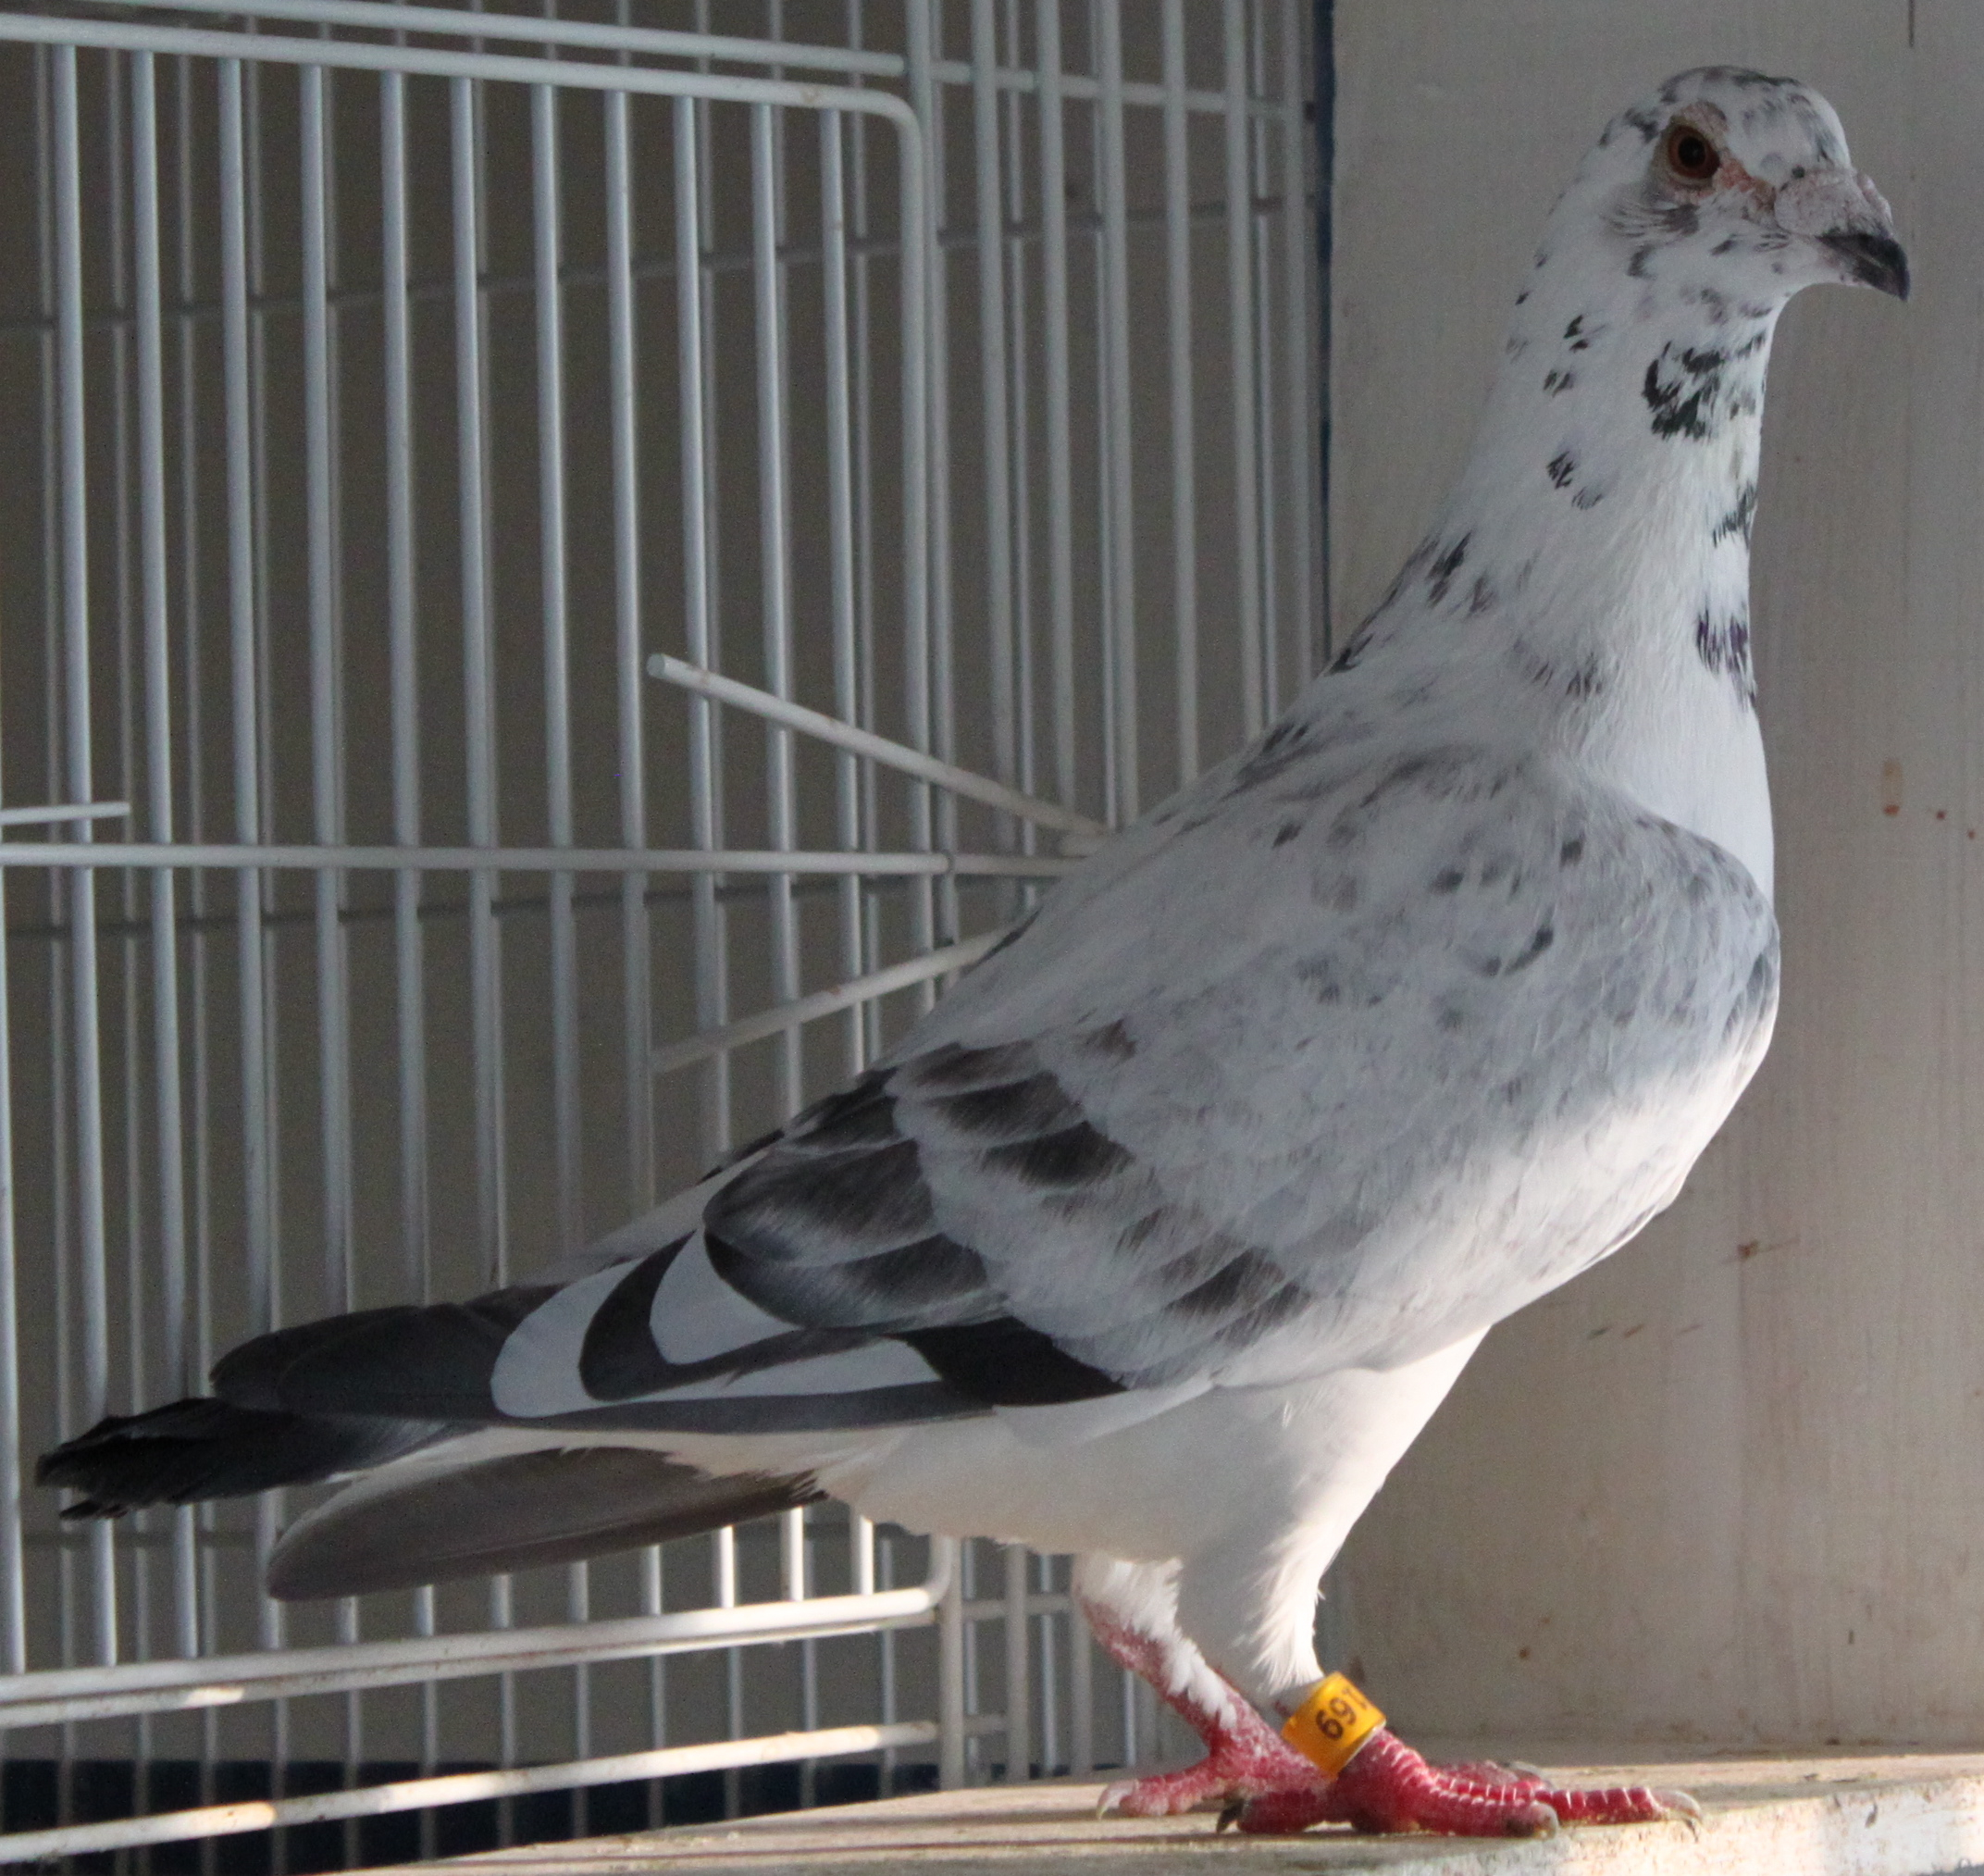 Racing pigeons breeding methods - photo#7